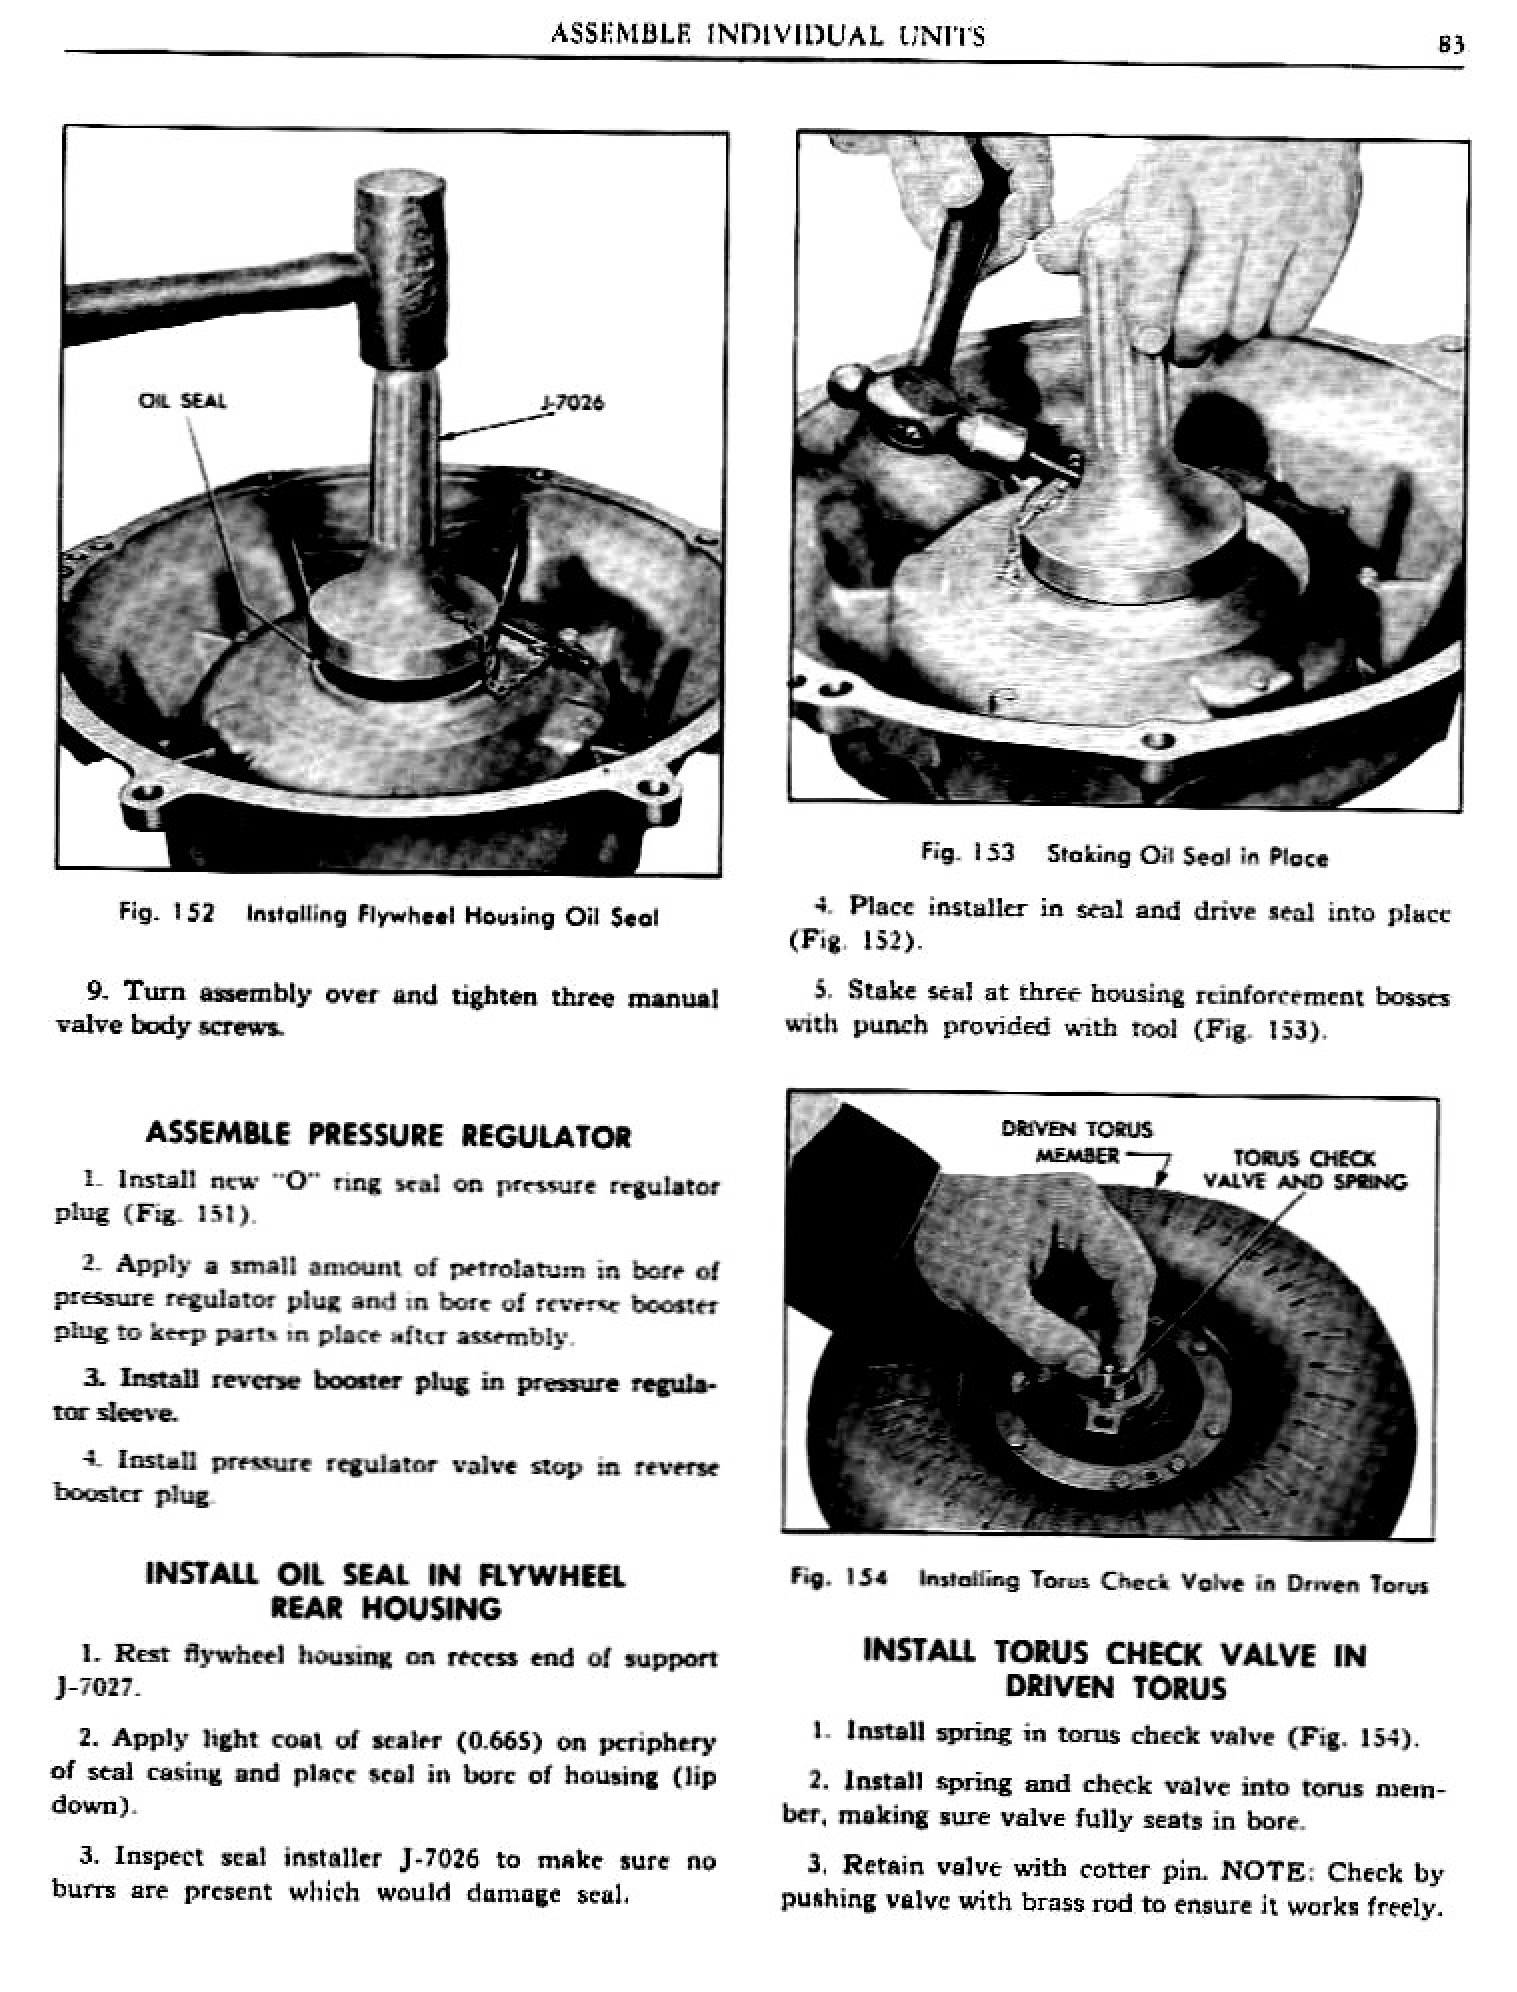 1960 Pontiac Shop Manual- Hydra-Matic Page 83 of 112